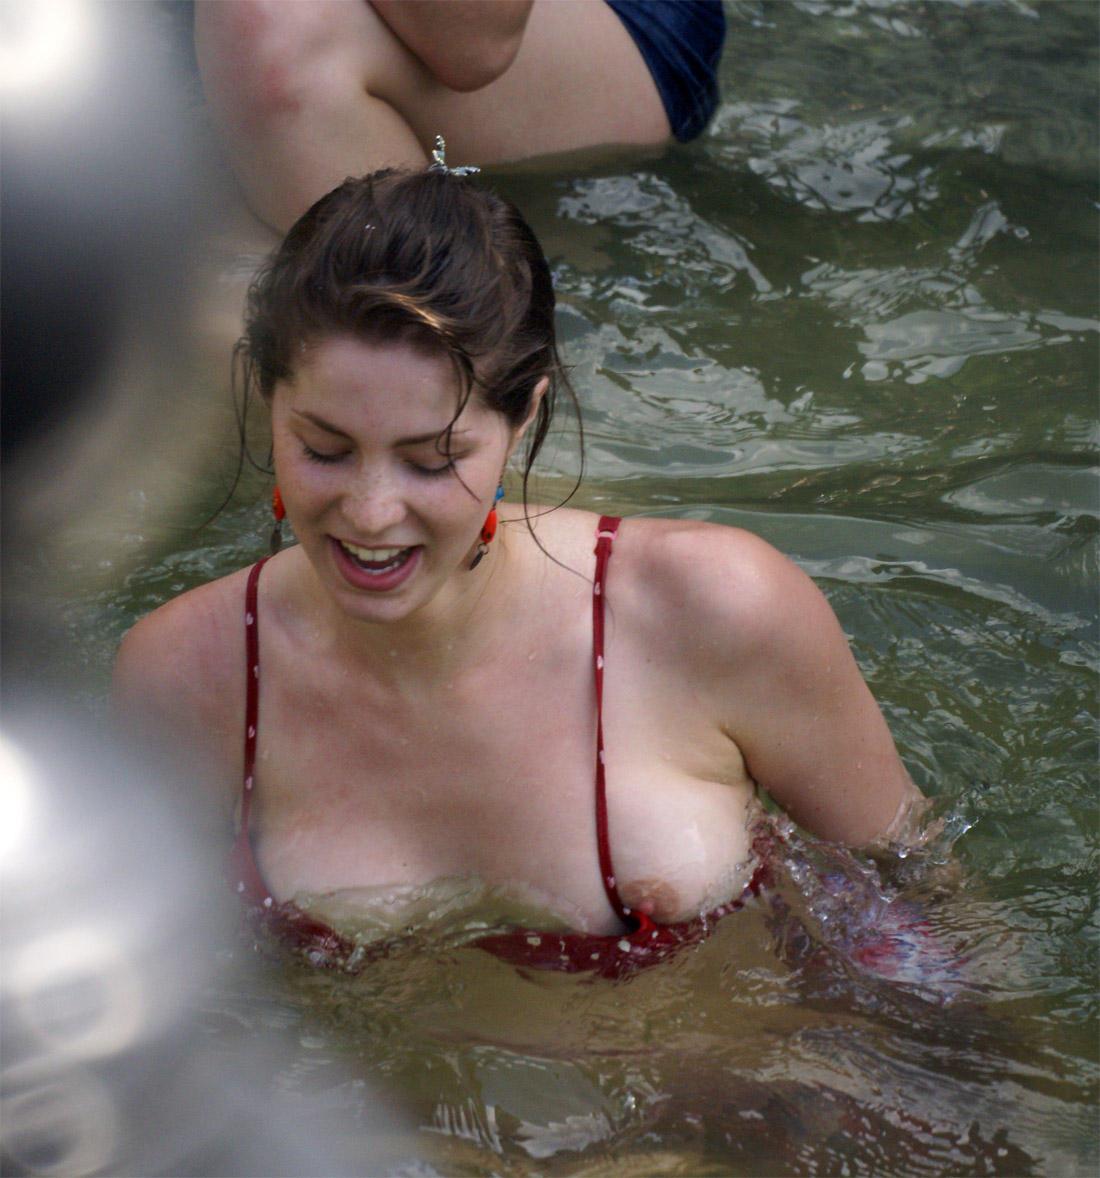 Nipple slip video aquapark 2 10